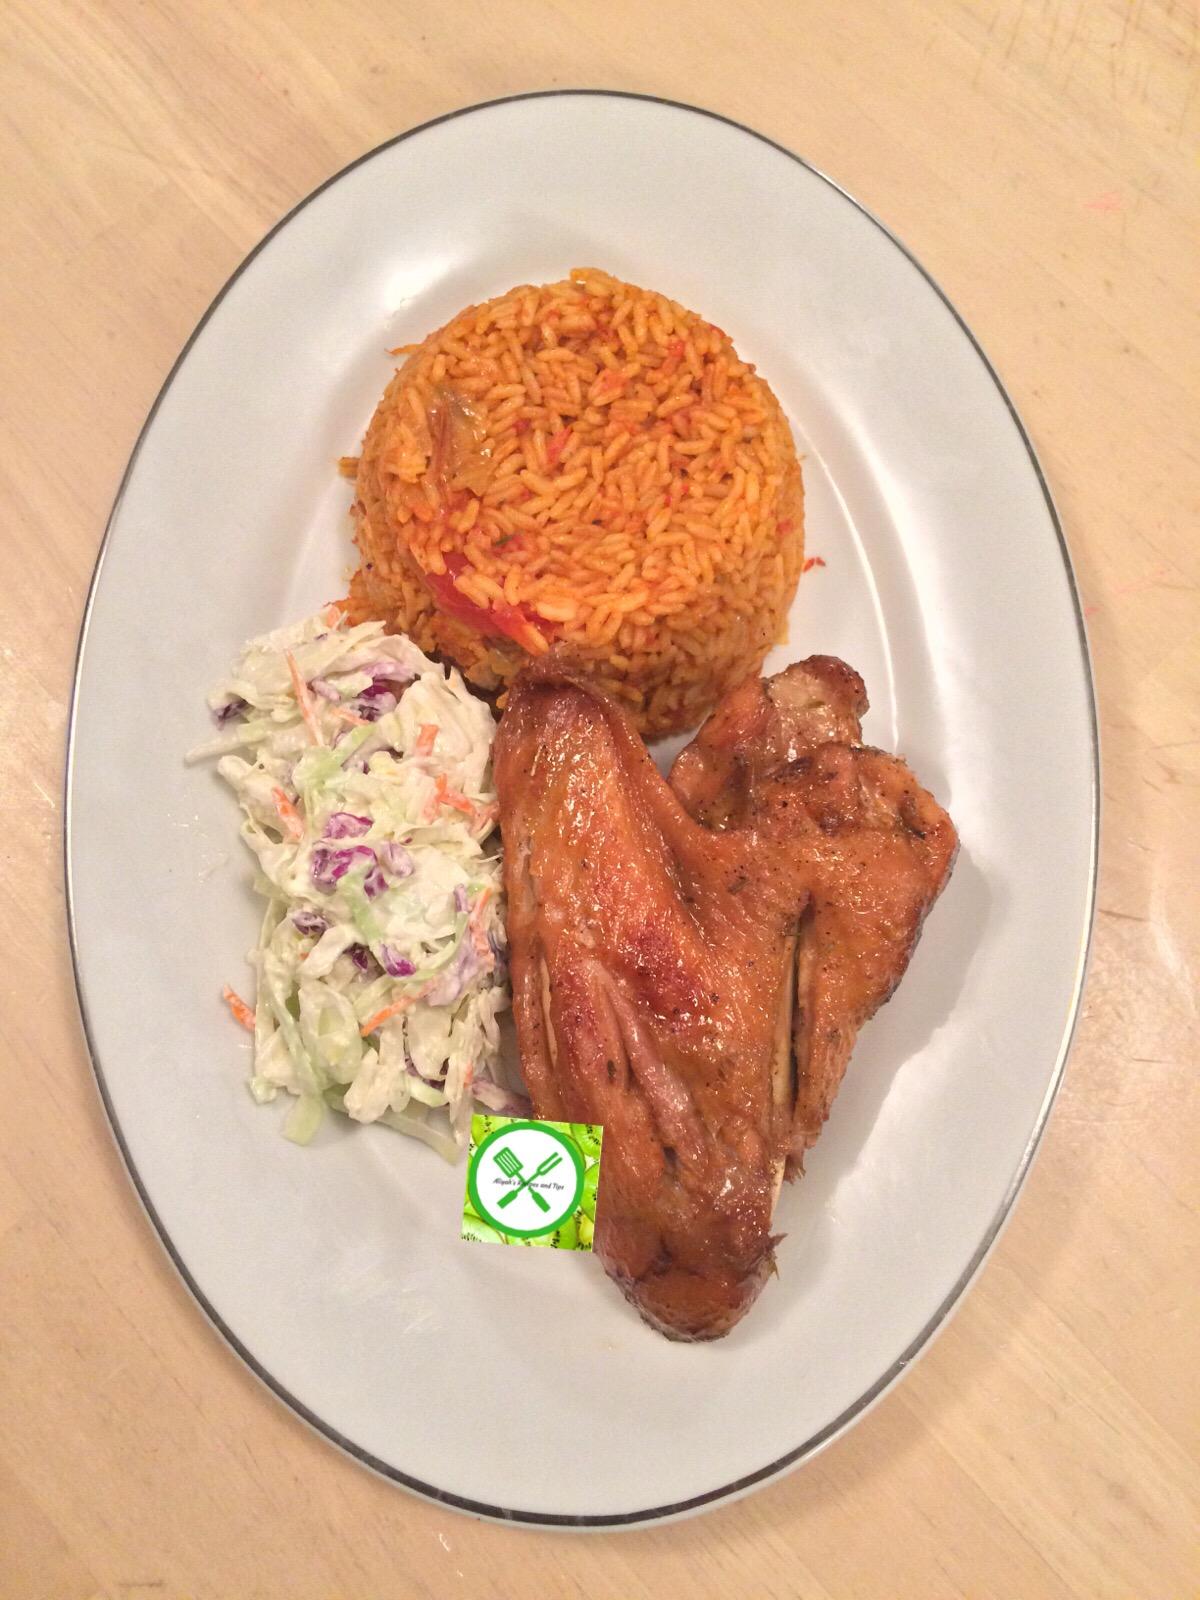 jollof rice served